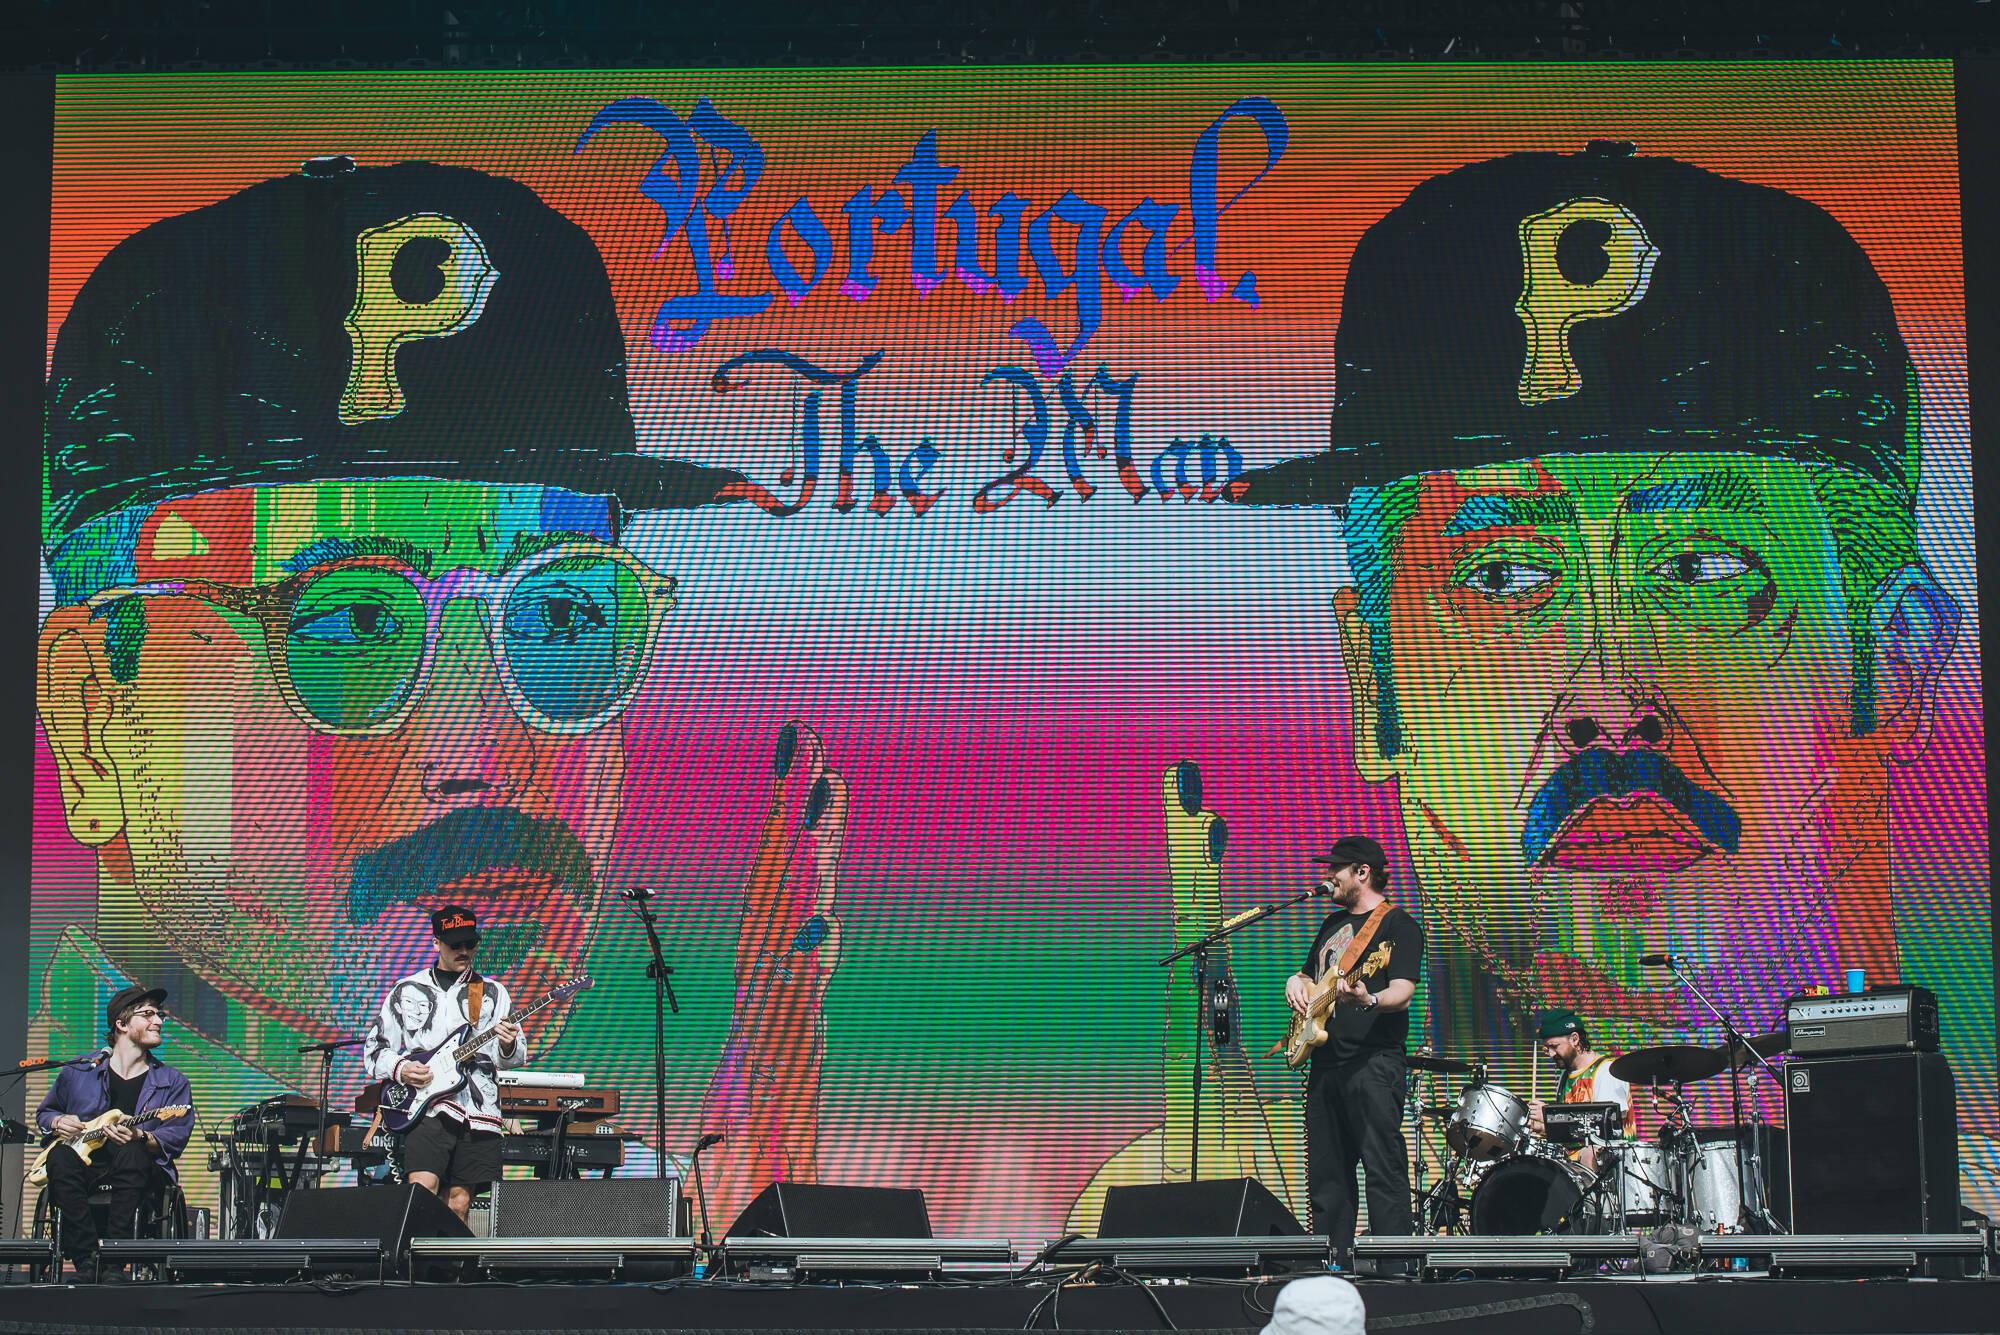 Lollapalooza 2019 - Portugal The Man. Foto: Divulgação/Lollapalooza